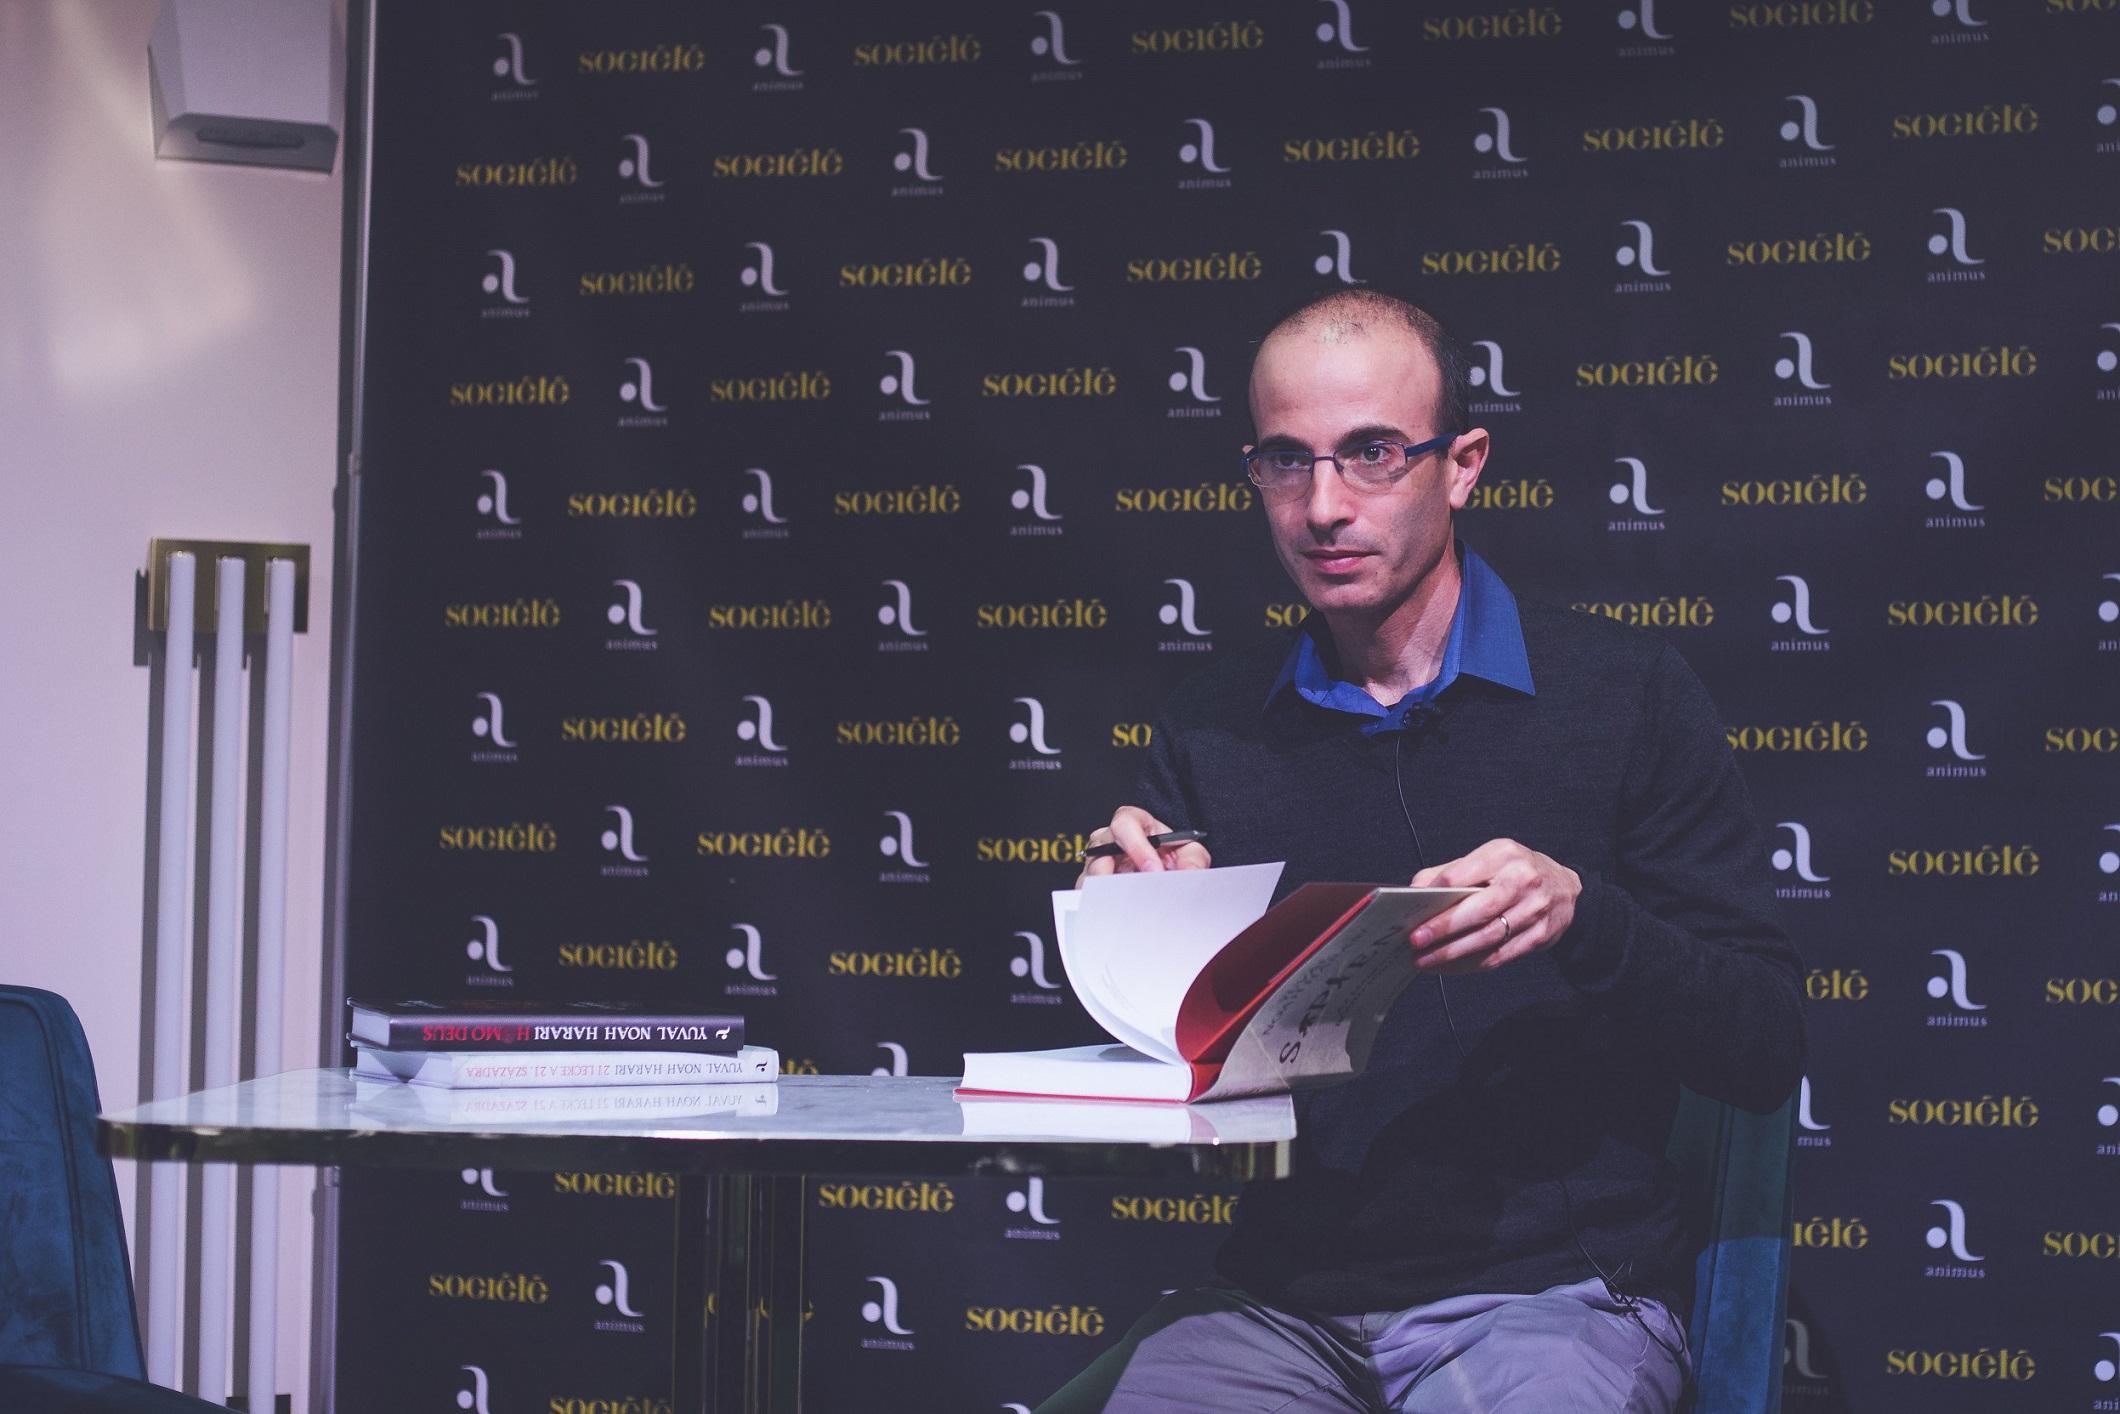 Prof. Harari at Societe Budapest press conference. Credit: Harari Team